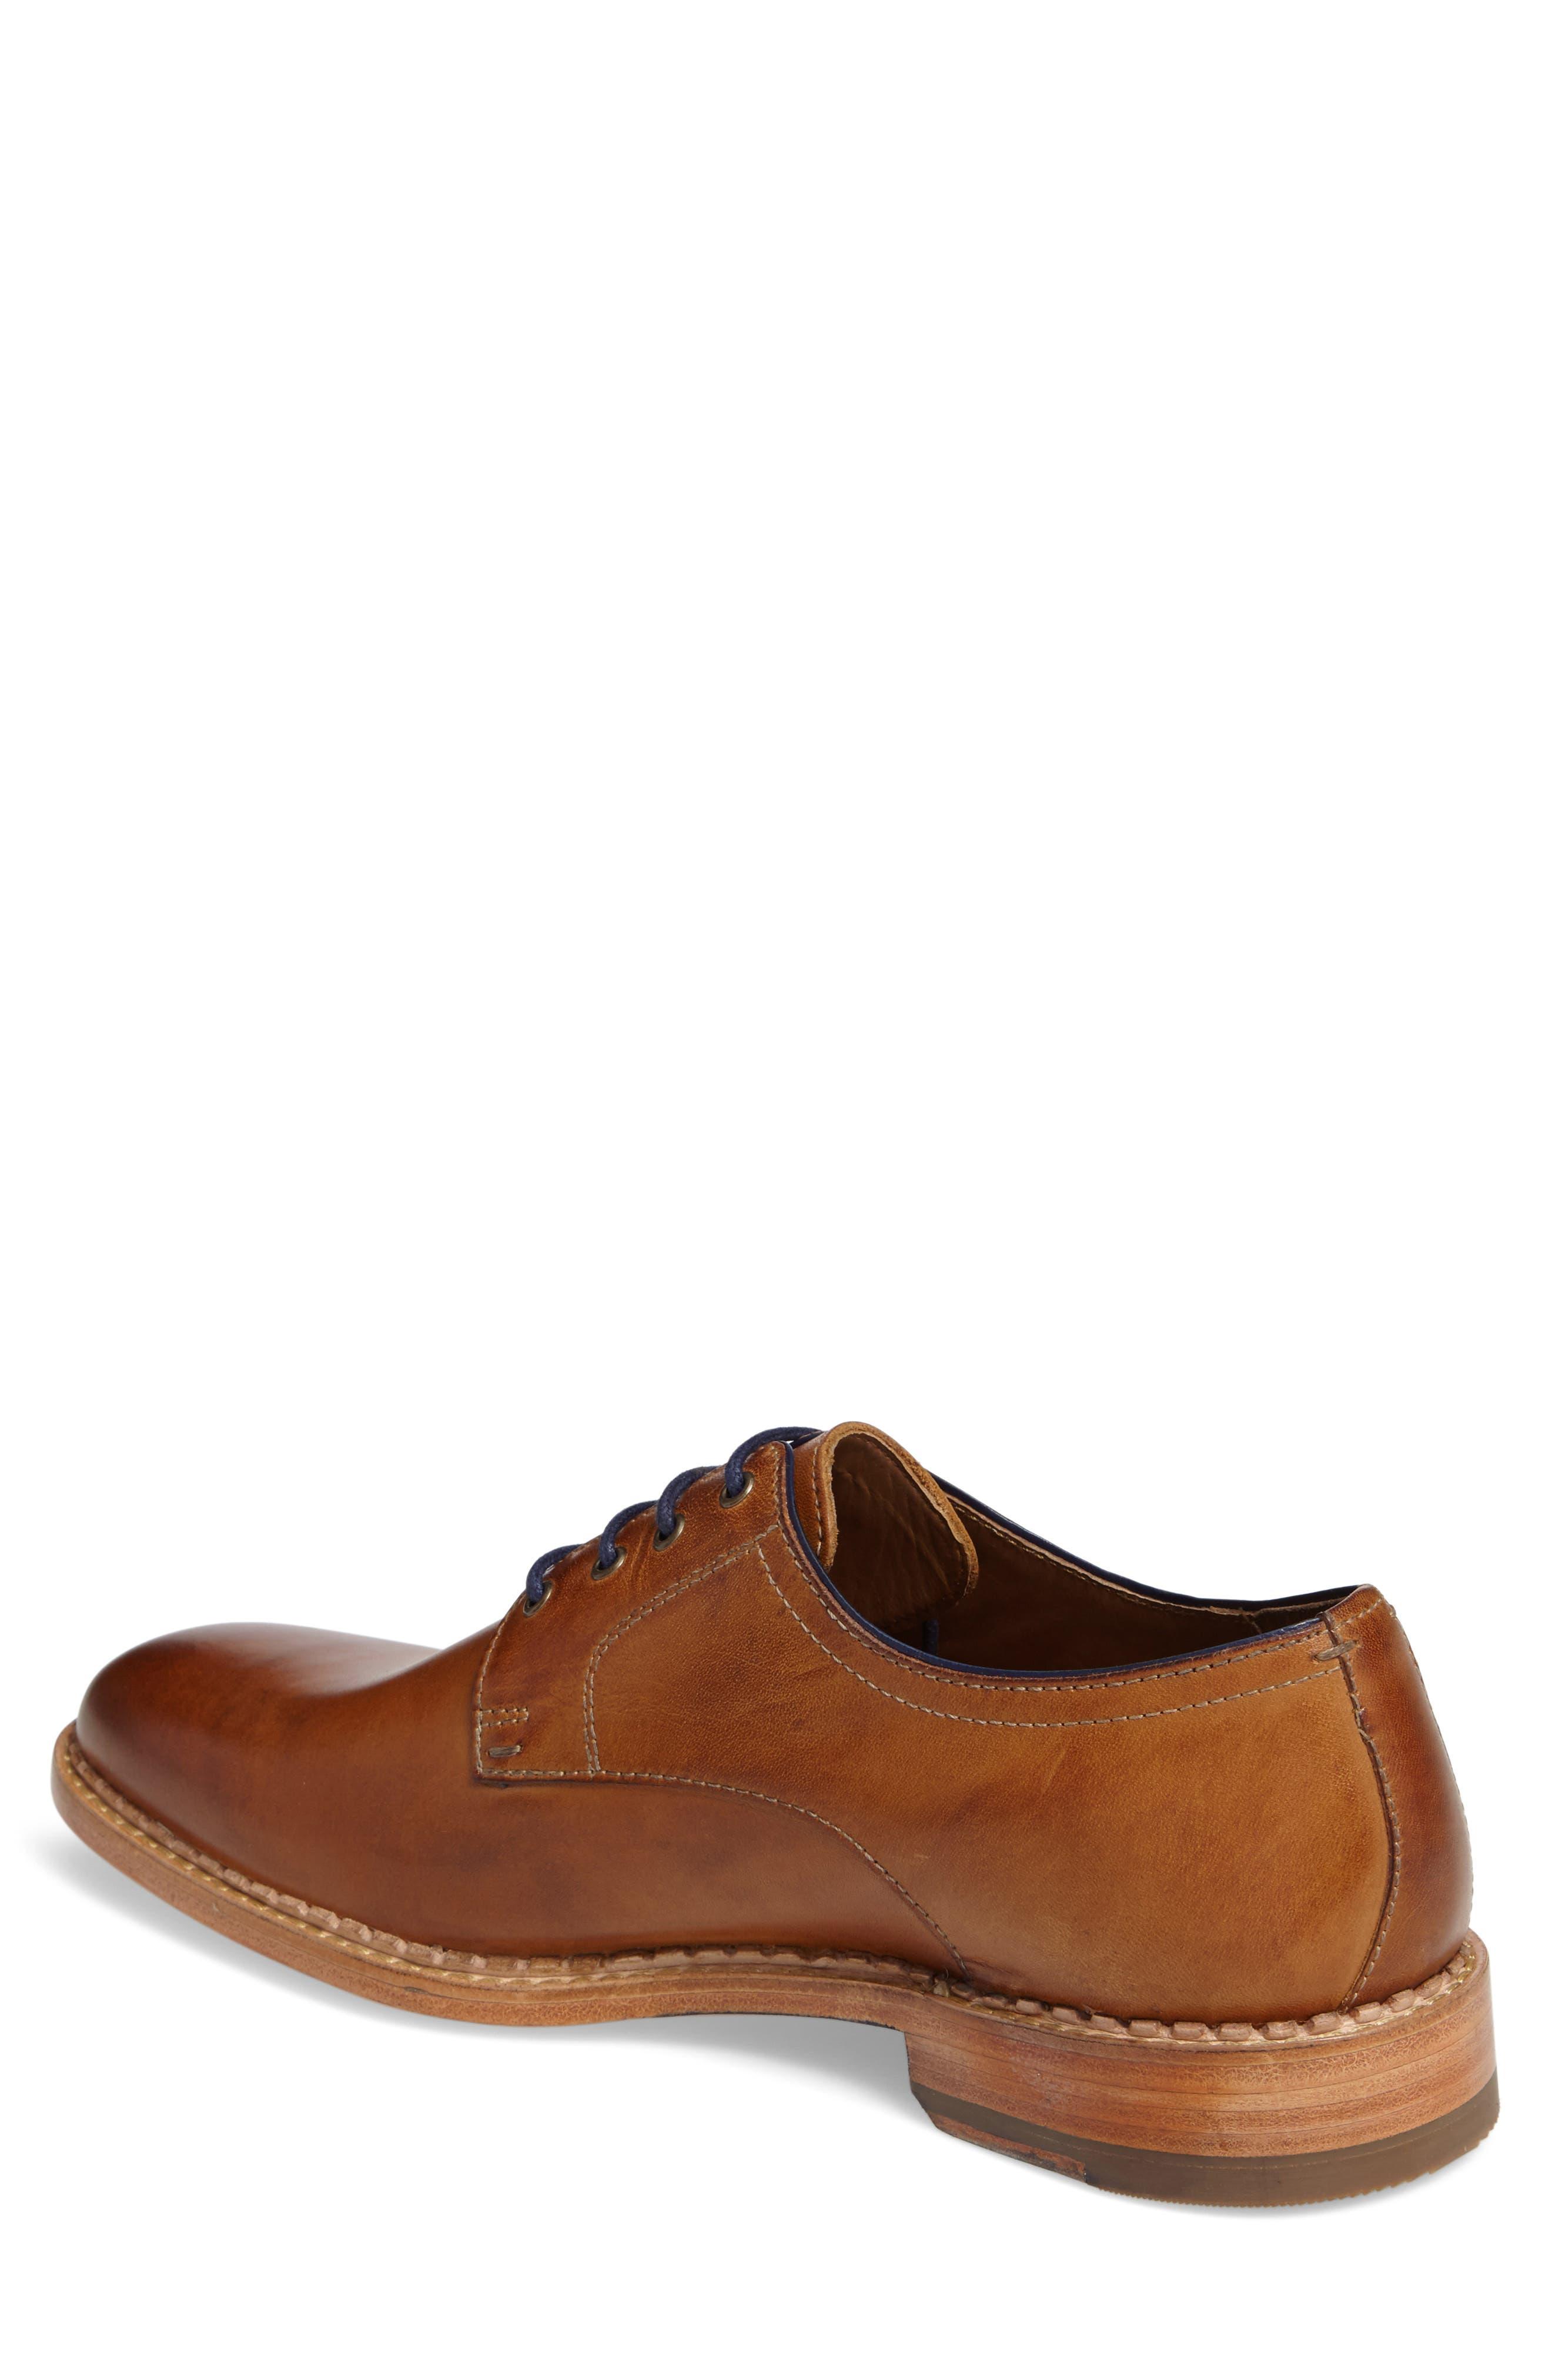 Chambliss Plain Toe Derby,                             Alternate thumbnail 2, color,                             Tan Calfskin